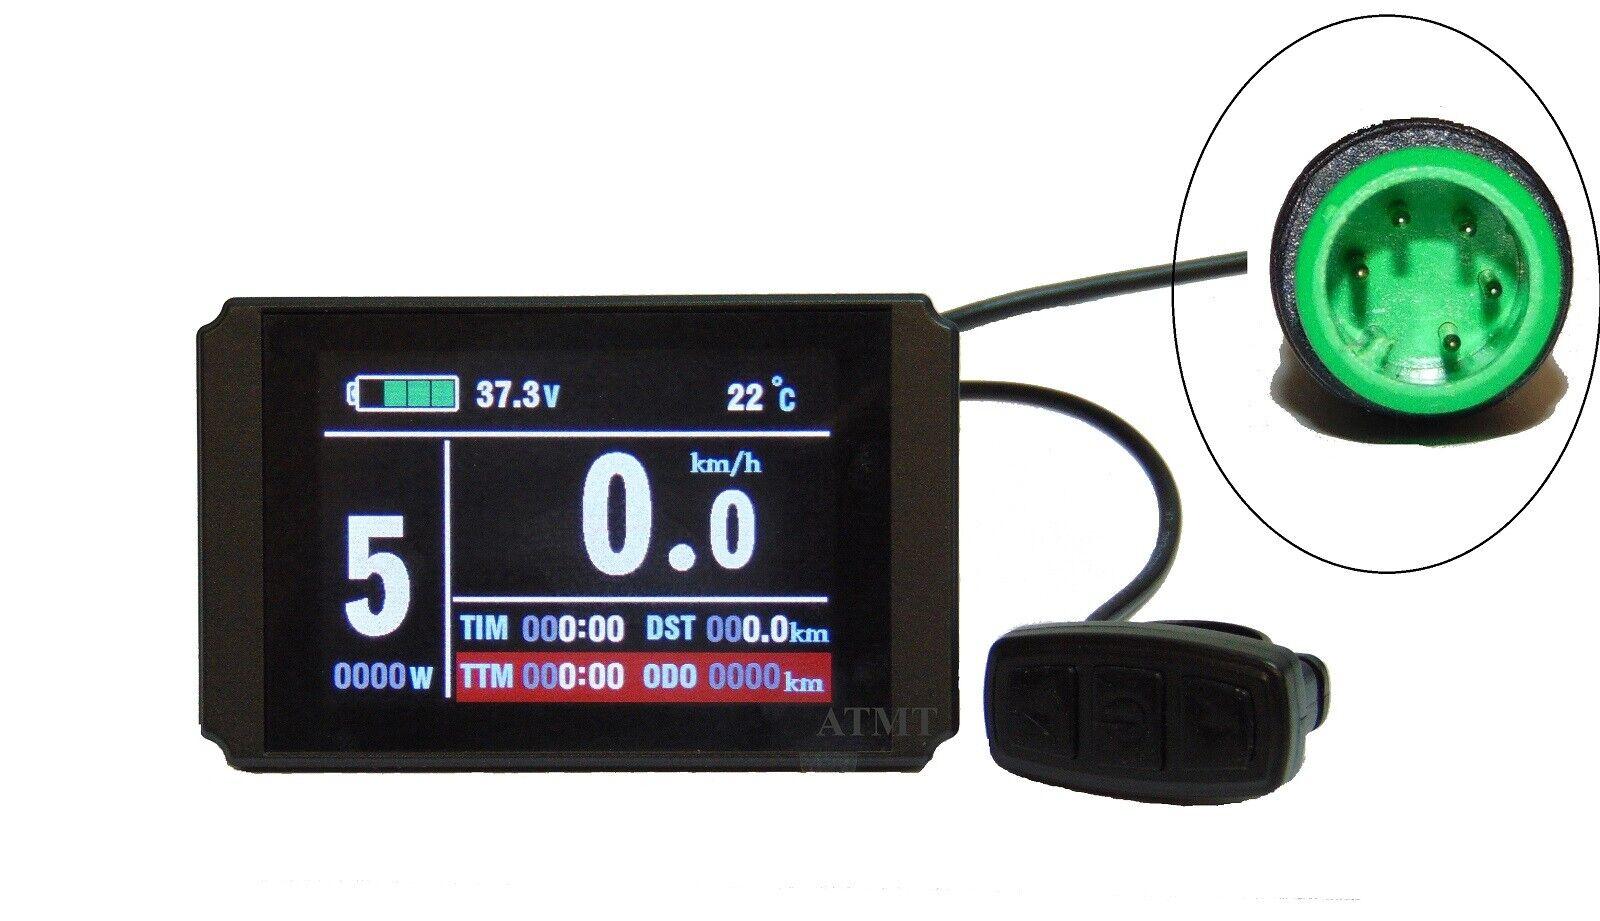 E-Bike Farbdisplay LCD8H TFT colour display für NCB Umrüstsatz mit KUNTENG CTRL